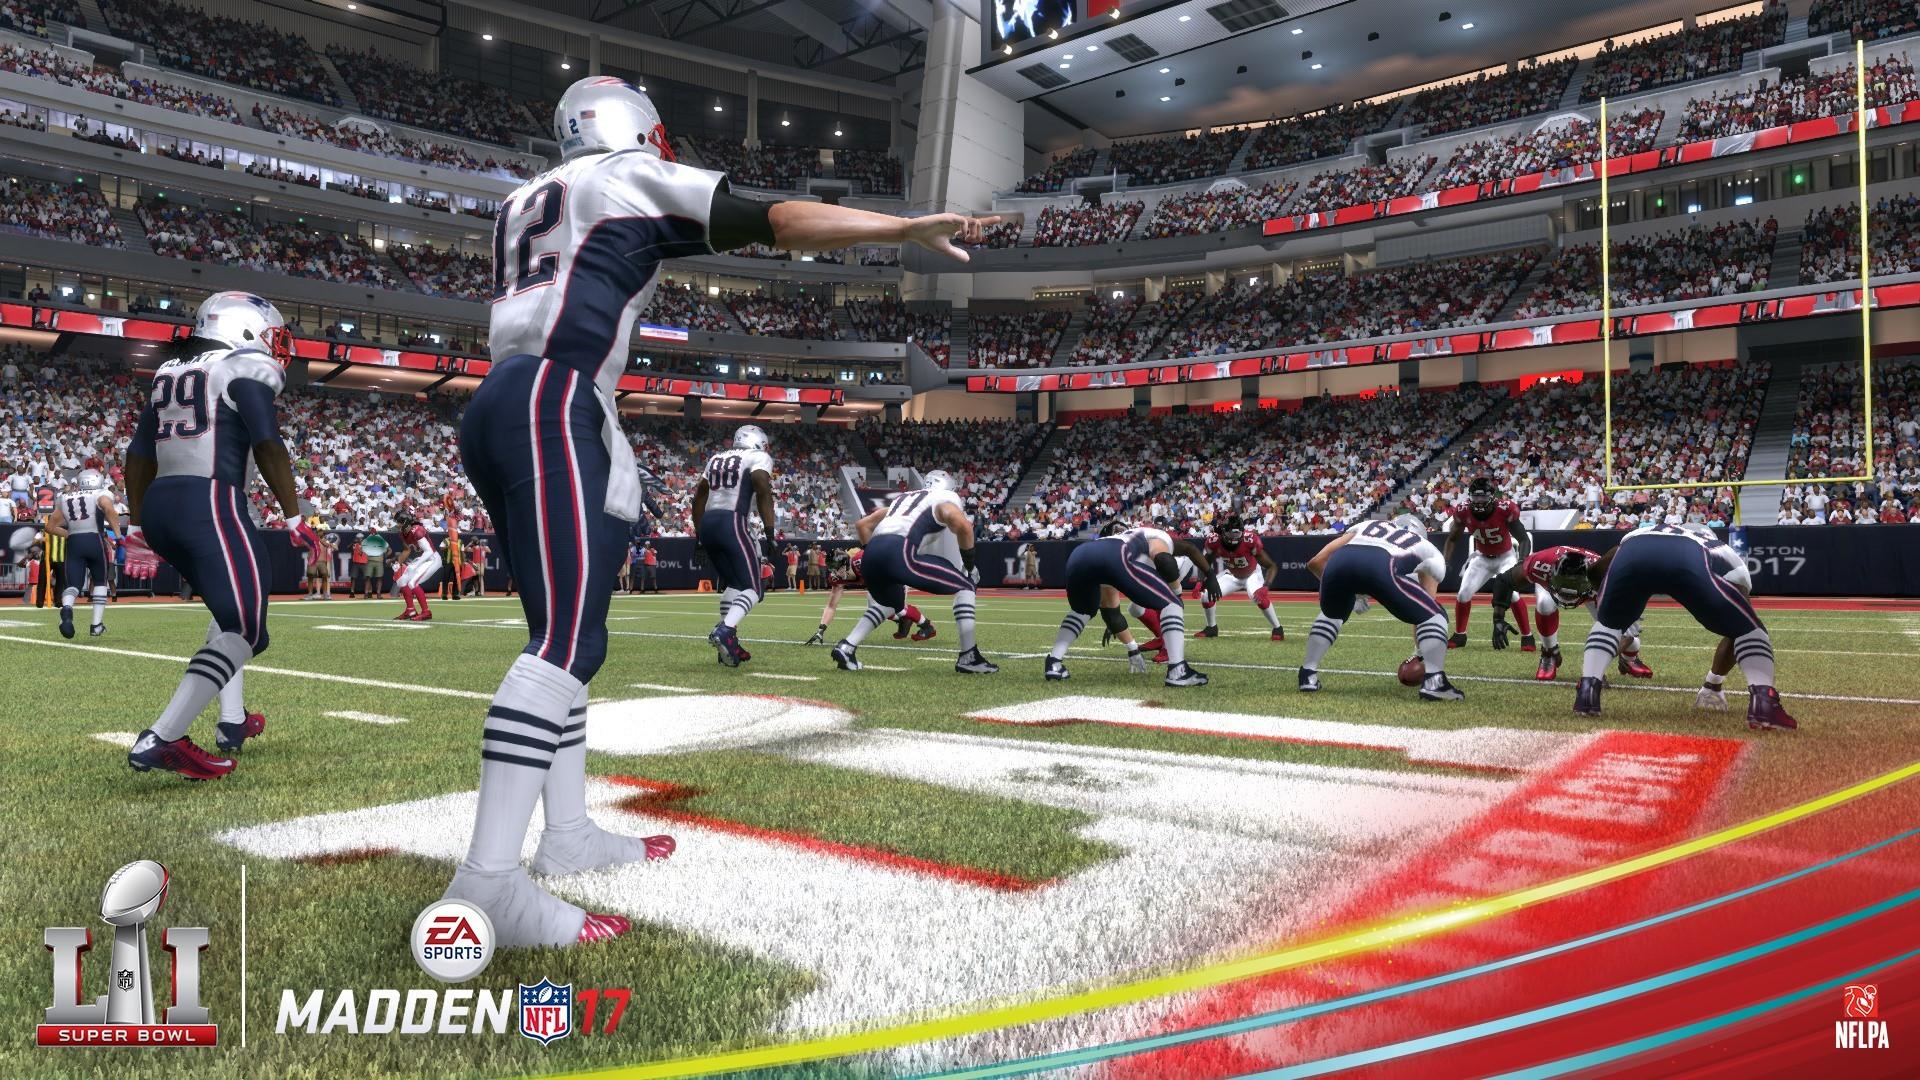 New England Patriots Win In Official Madden NFL 17 Super Bowl LI